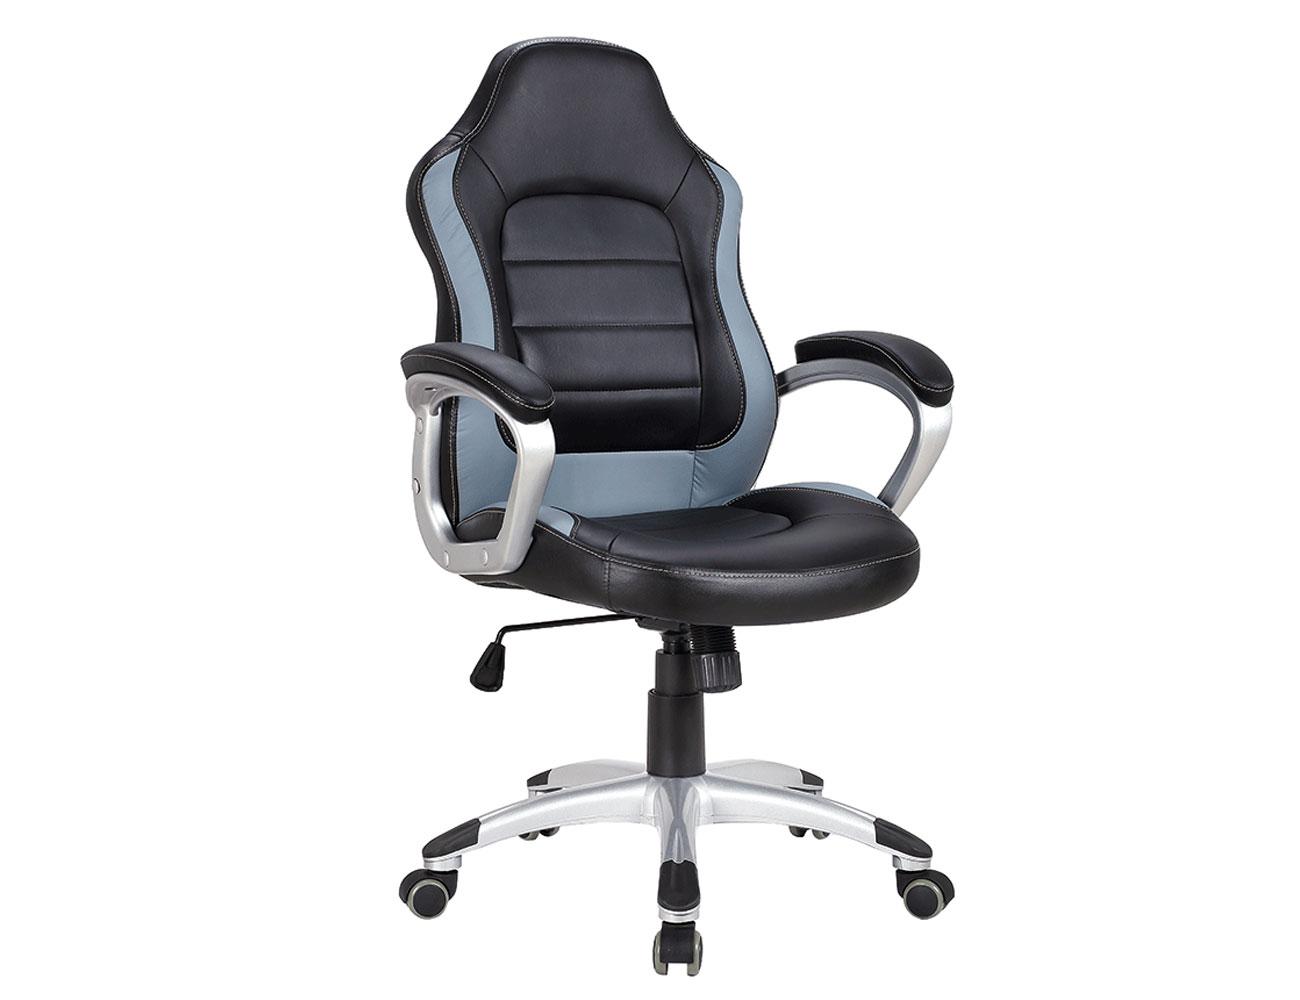 Silla oficina ergonomica polipiel brazos ruedas gris1